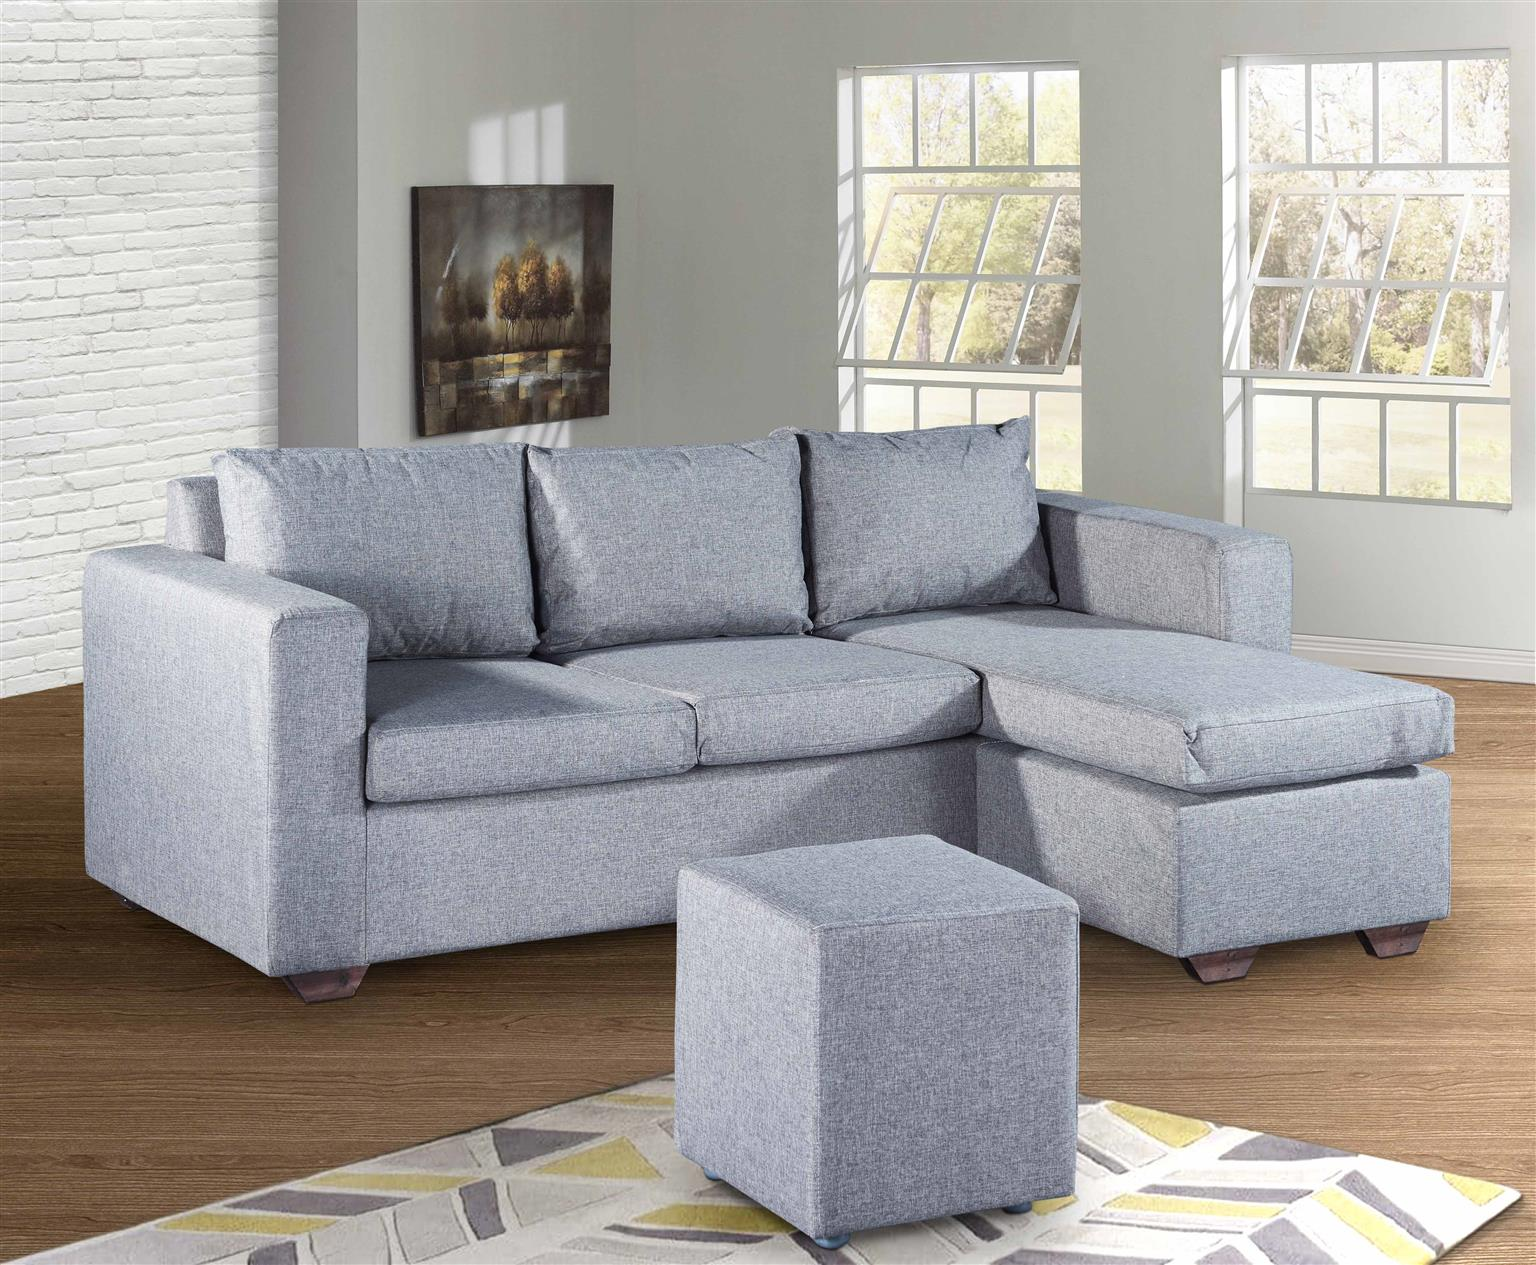 Living Room Furniture Gauteng Pretoria Centurion New Corner Lounge Suite